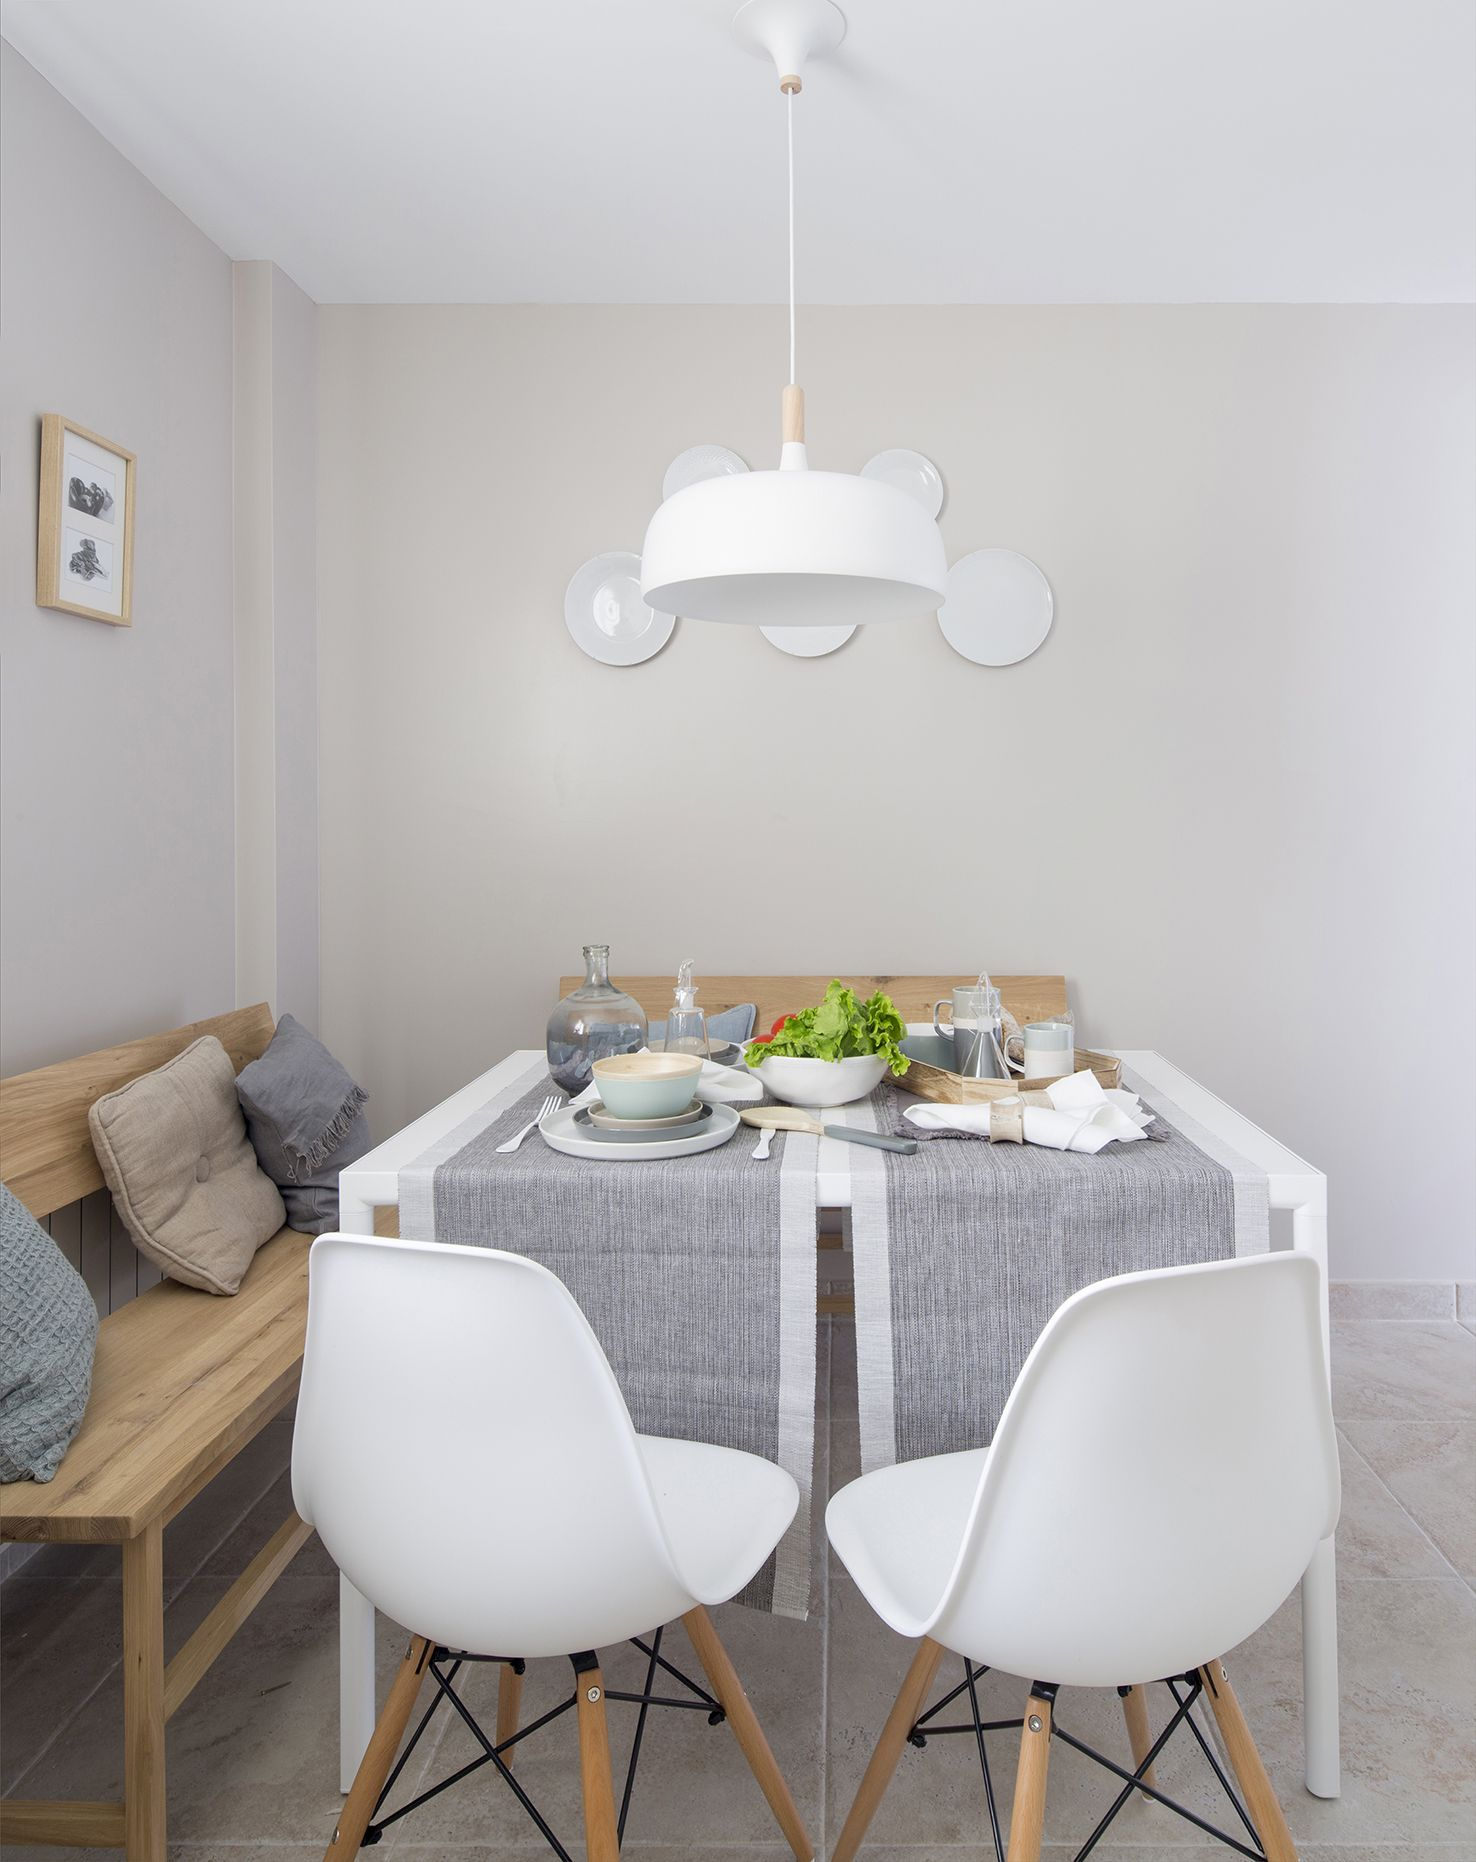 Office cocina en vivienda íntegramente reformada por Natalia Zubizarreta  Interiorismo en Gernika 0fa41c093466